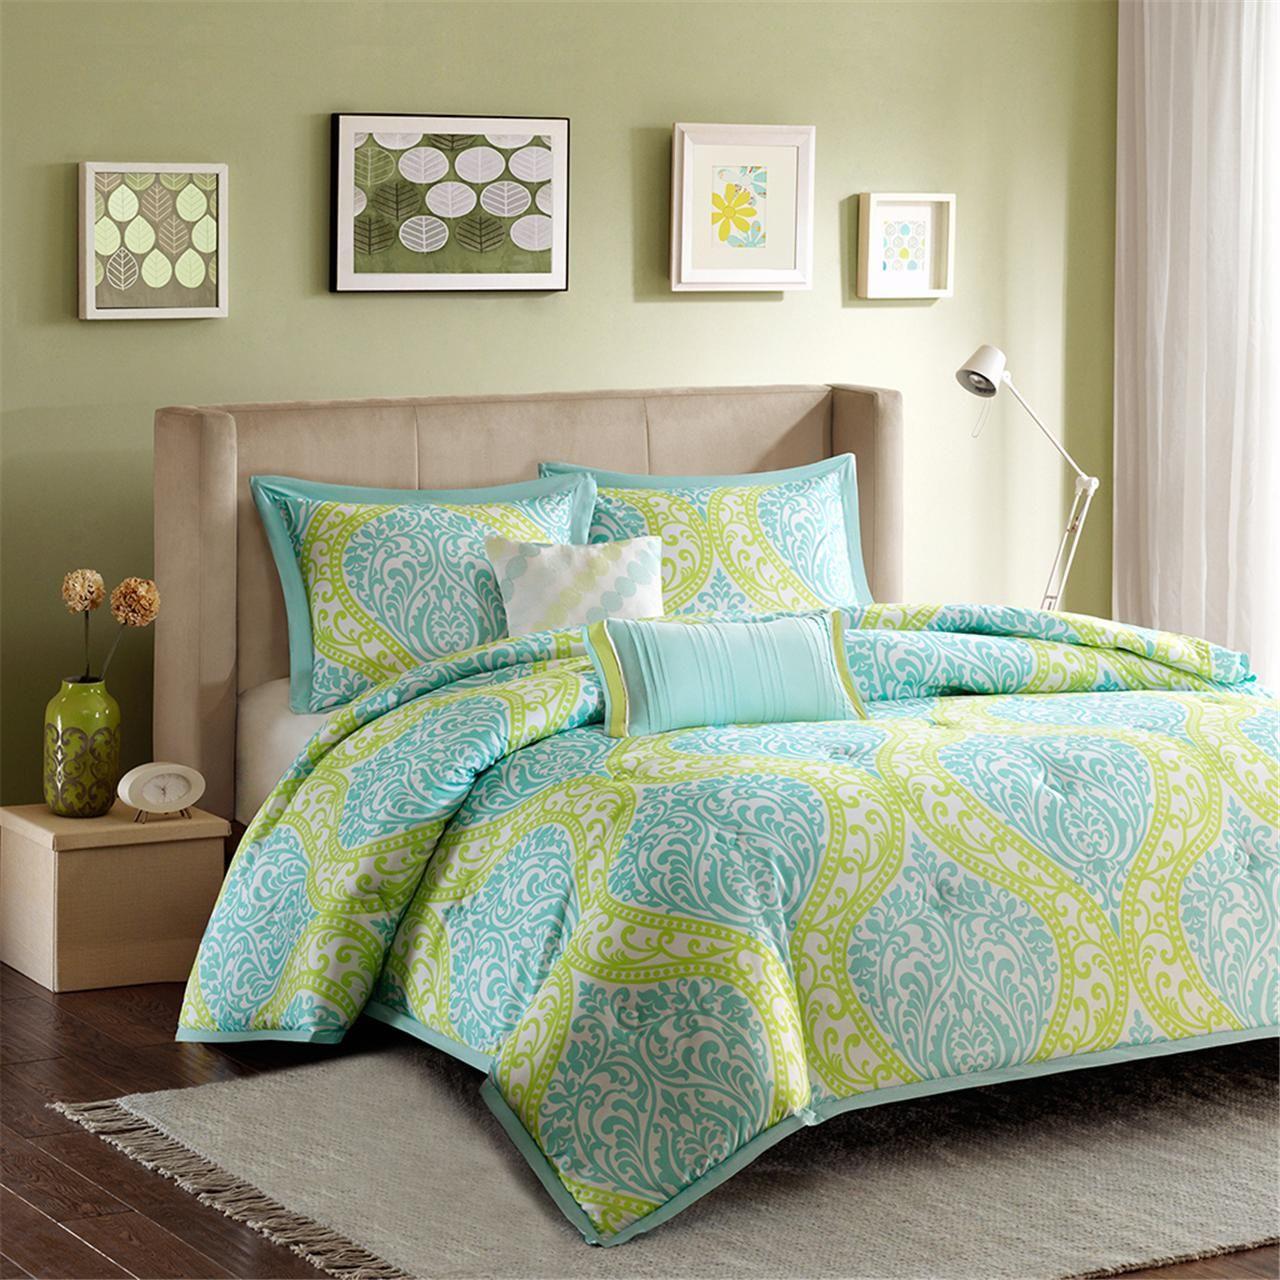 Intelligent Design Senna Comforter SetDesigner Living